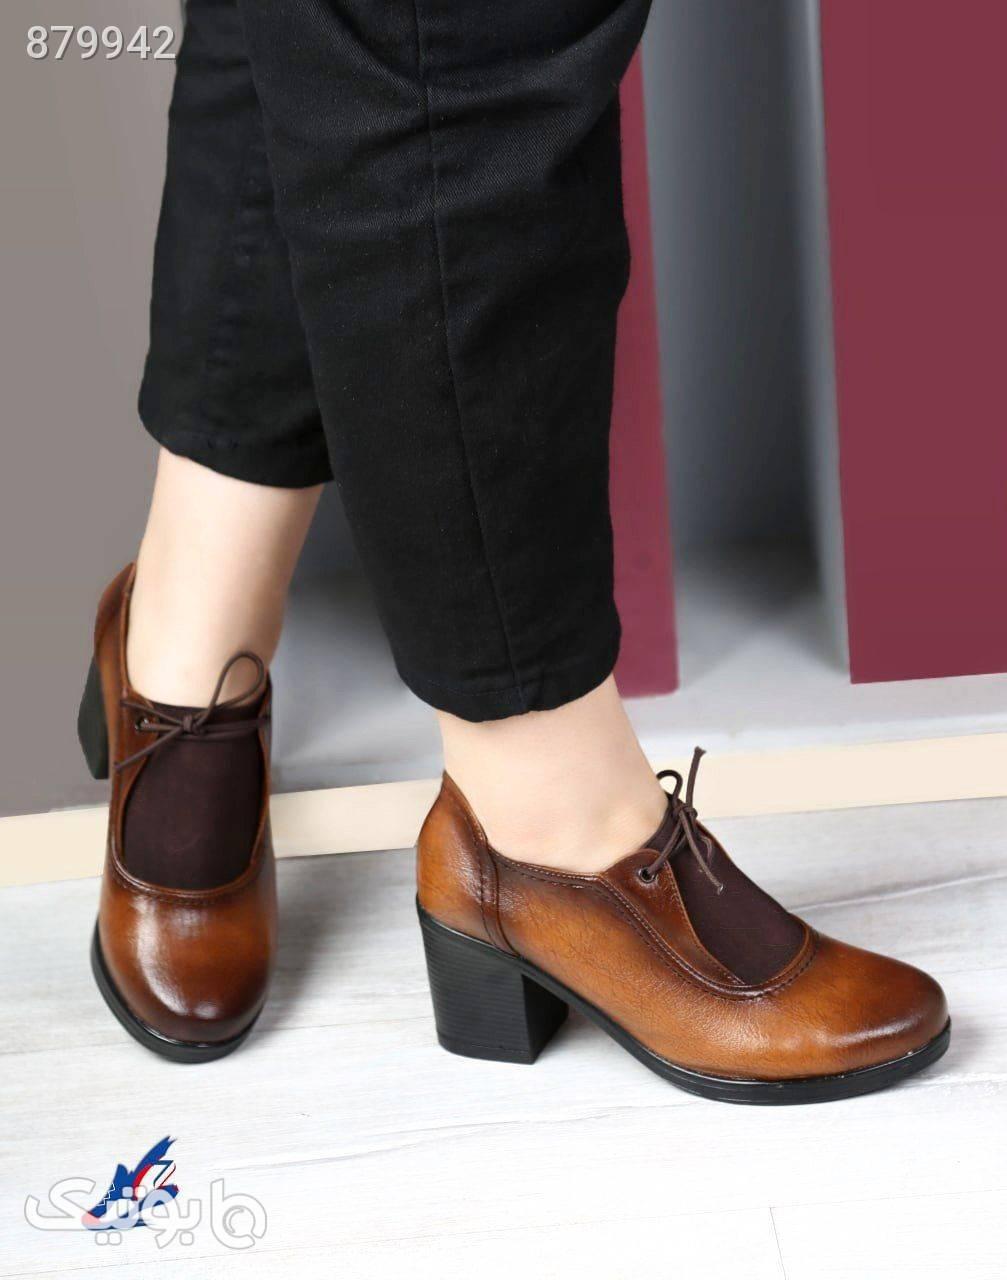 کفش کلاسیک کد 34پاشنه۷سانت پشت چرم مشکی كفش پاشنه بلند زنانه